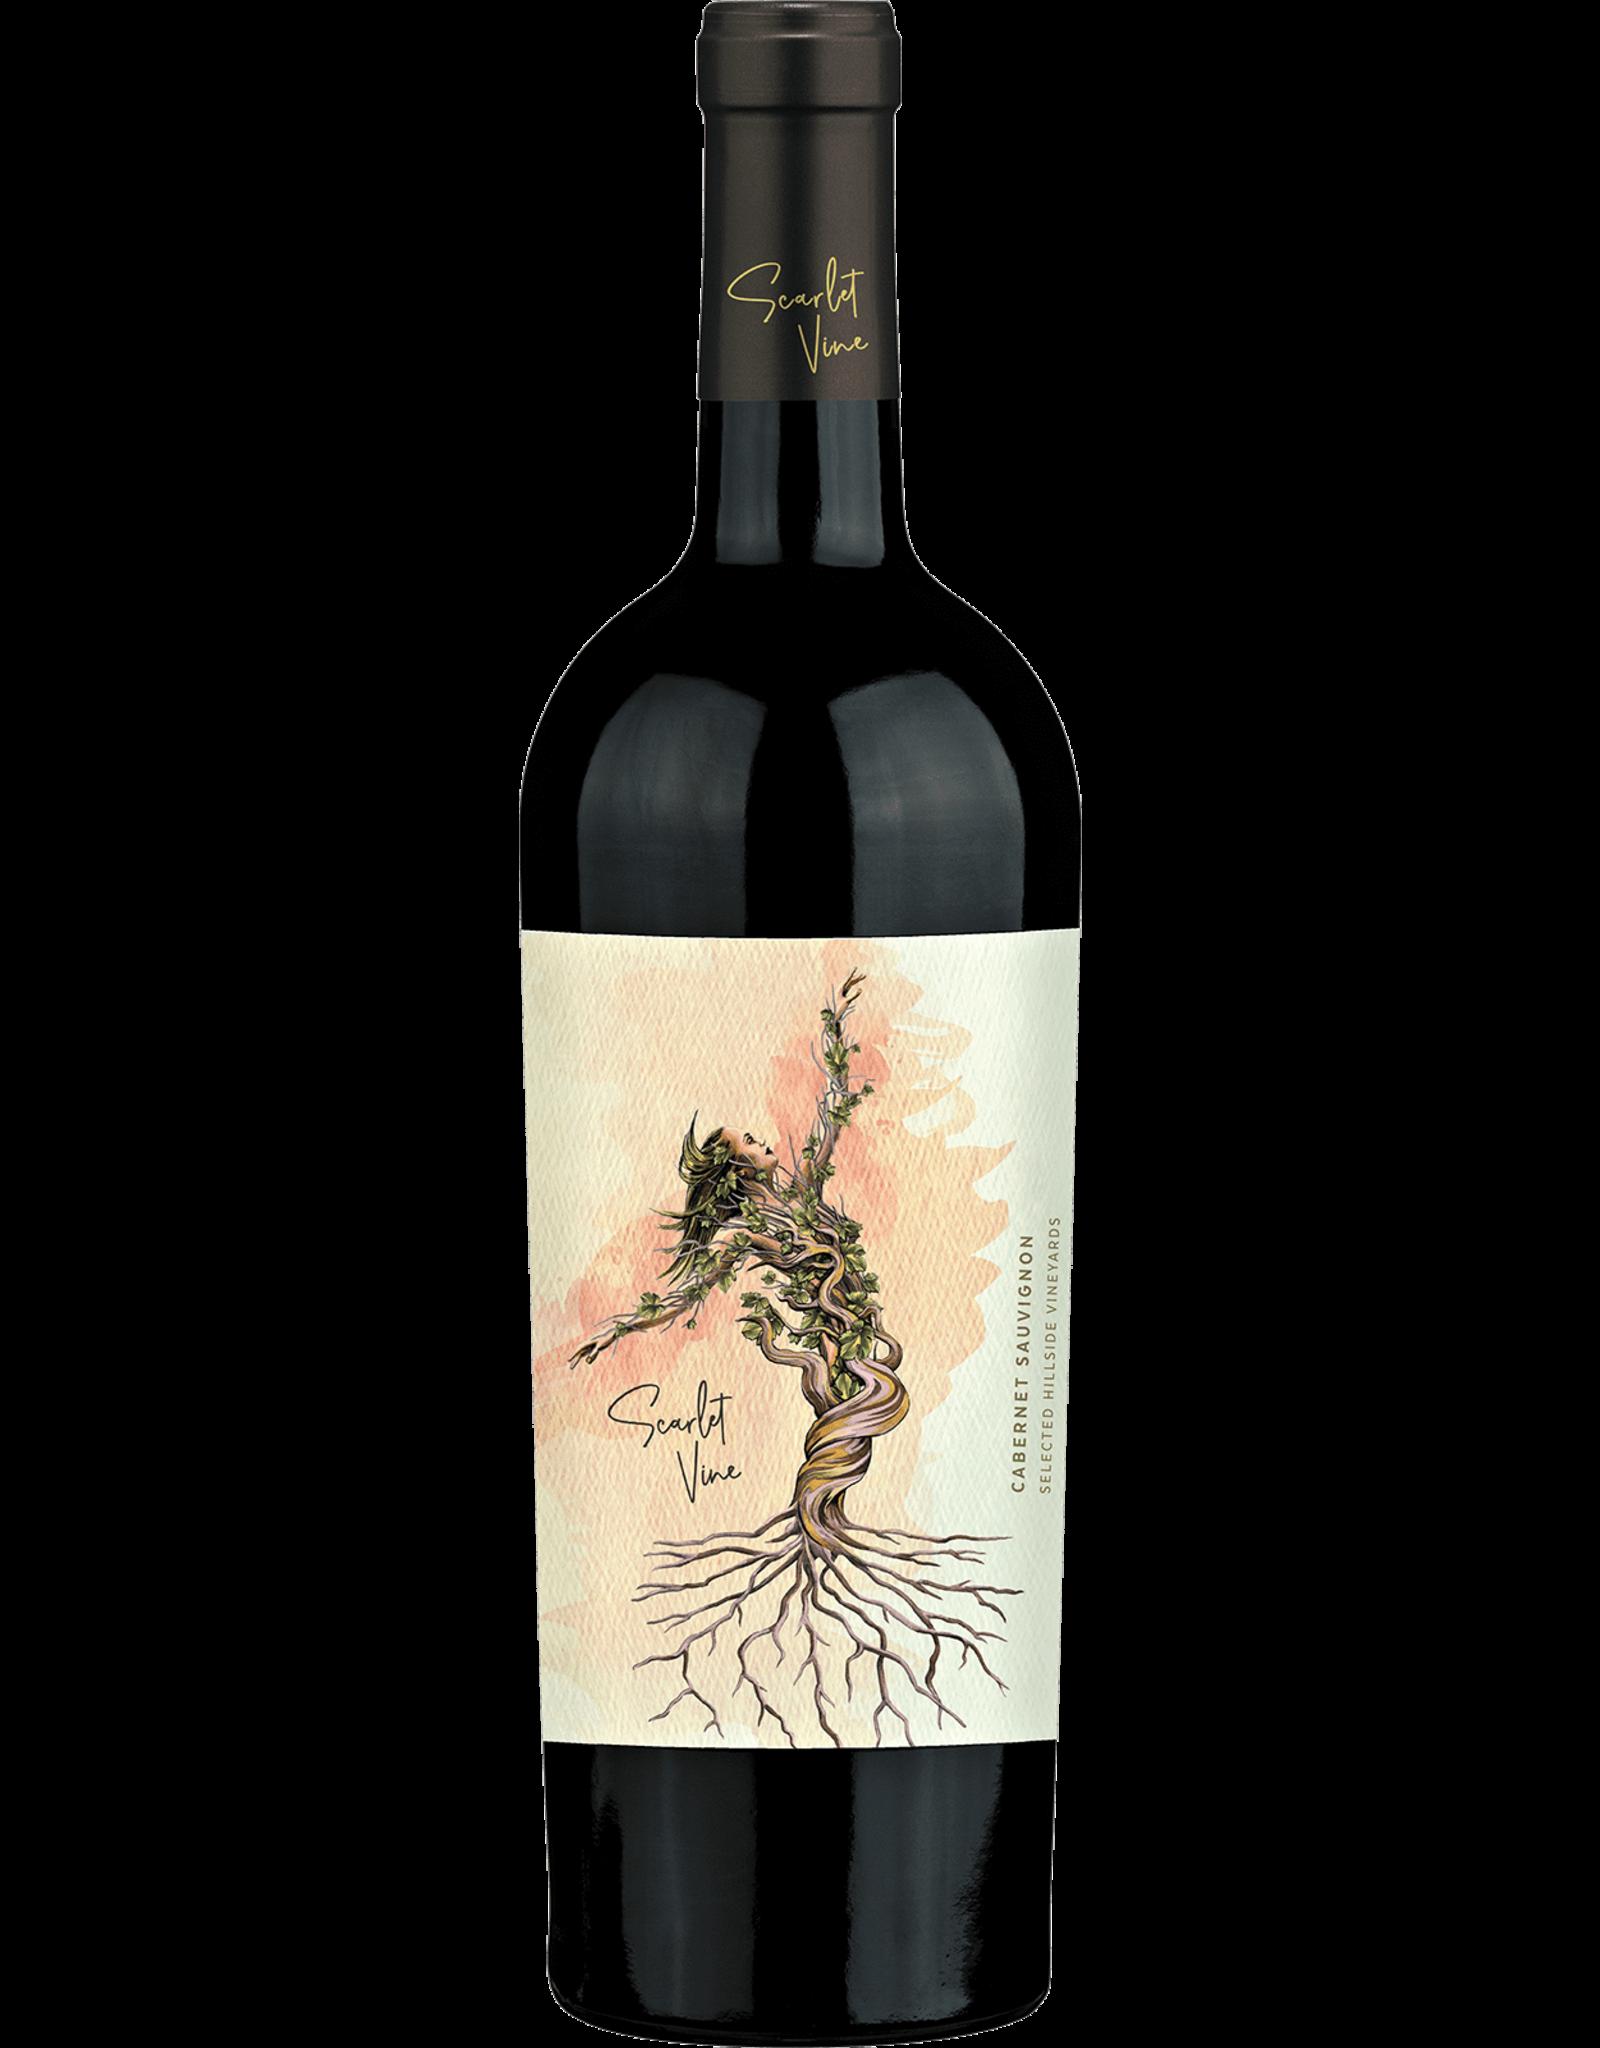 Scarlet Vine Cabernet Sauvignon 2019